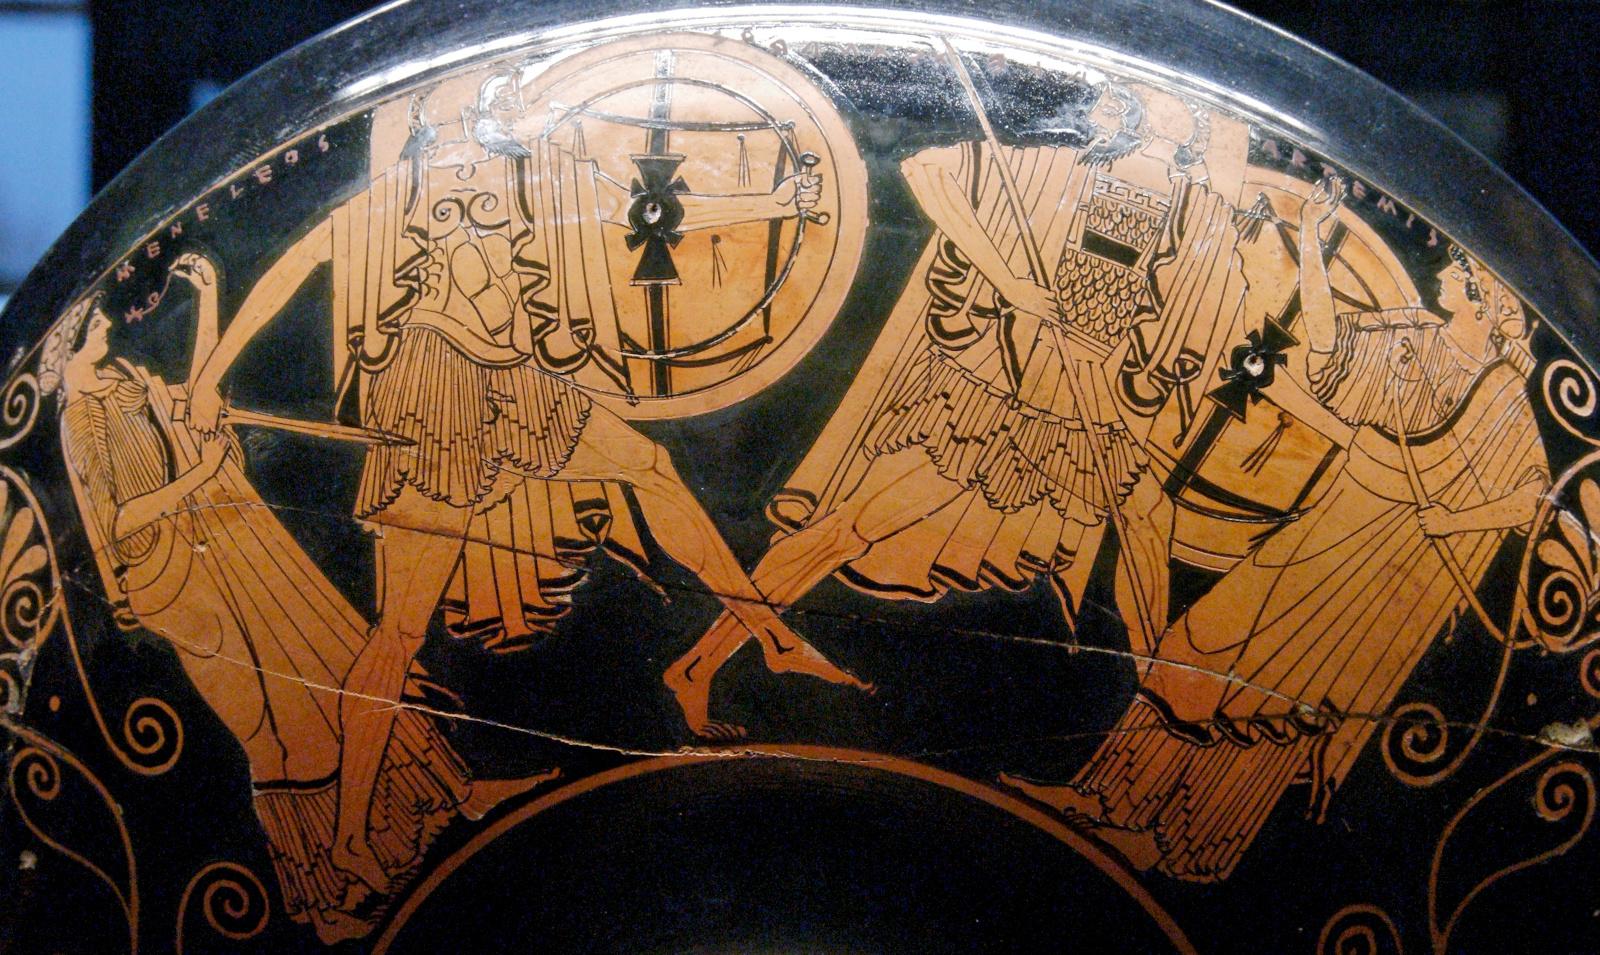 "Attisch-rotfigurige Trinkschale, gegen 490 v. Chr. Ton. Paris, Musée du Louvre Inv. G 115. <br>Quelle: <a href=""https://commons.wikimedia.org/wiki/File:Menelaus_Paris_Louvre_G115.jpg"">User:Jastrow / Wikimedia Commons</a><br> Lizenz: Public Domain"